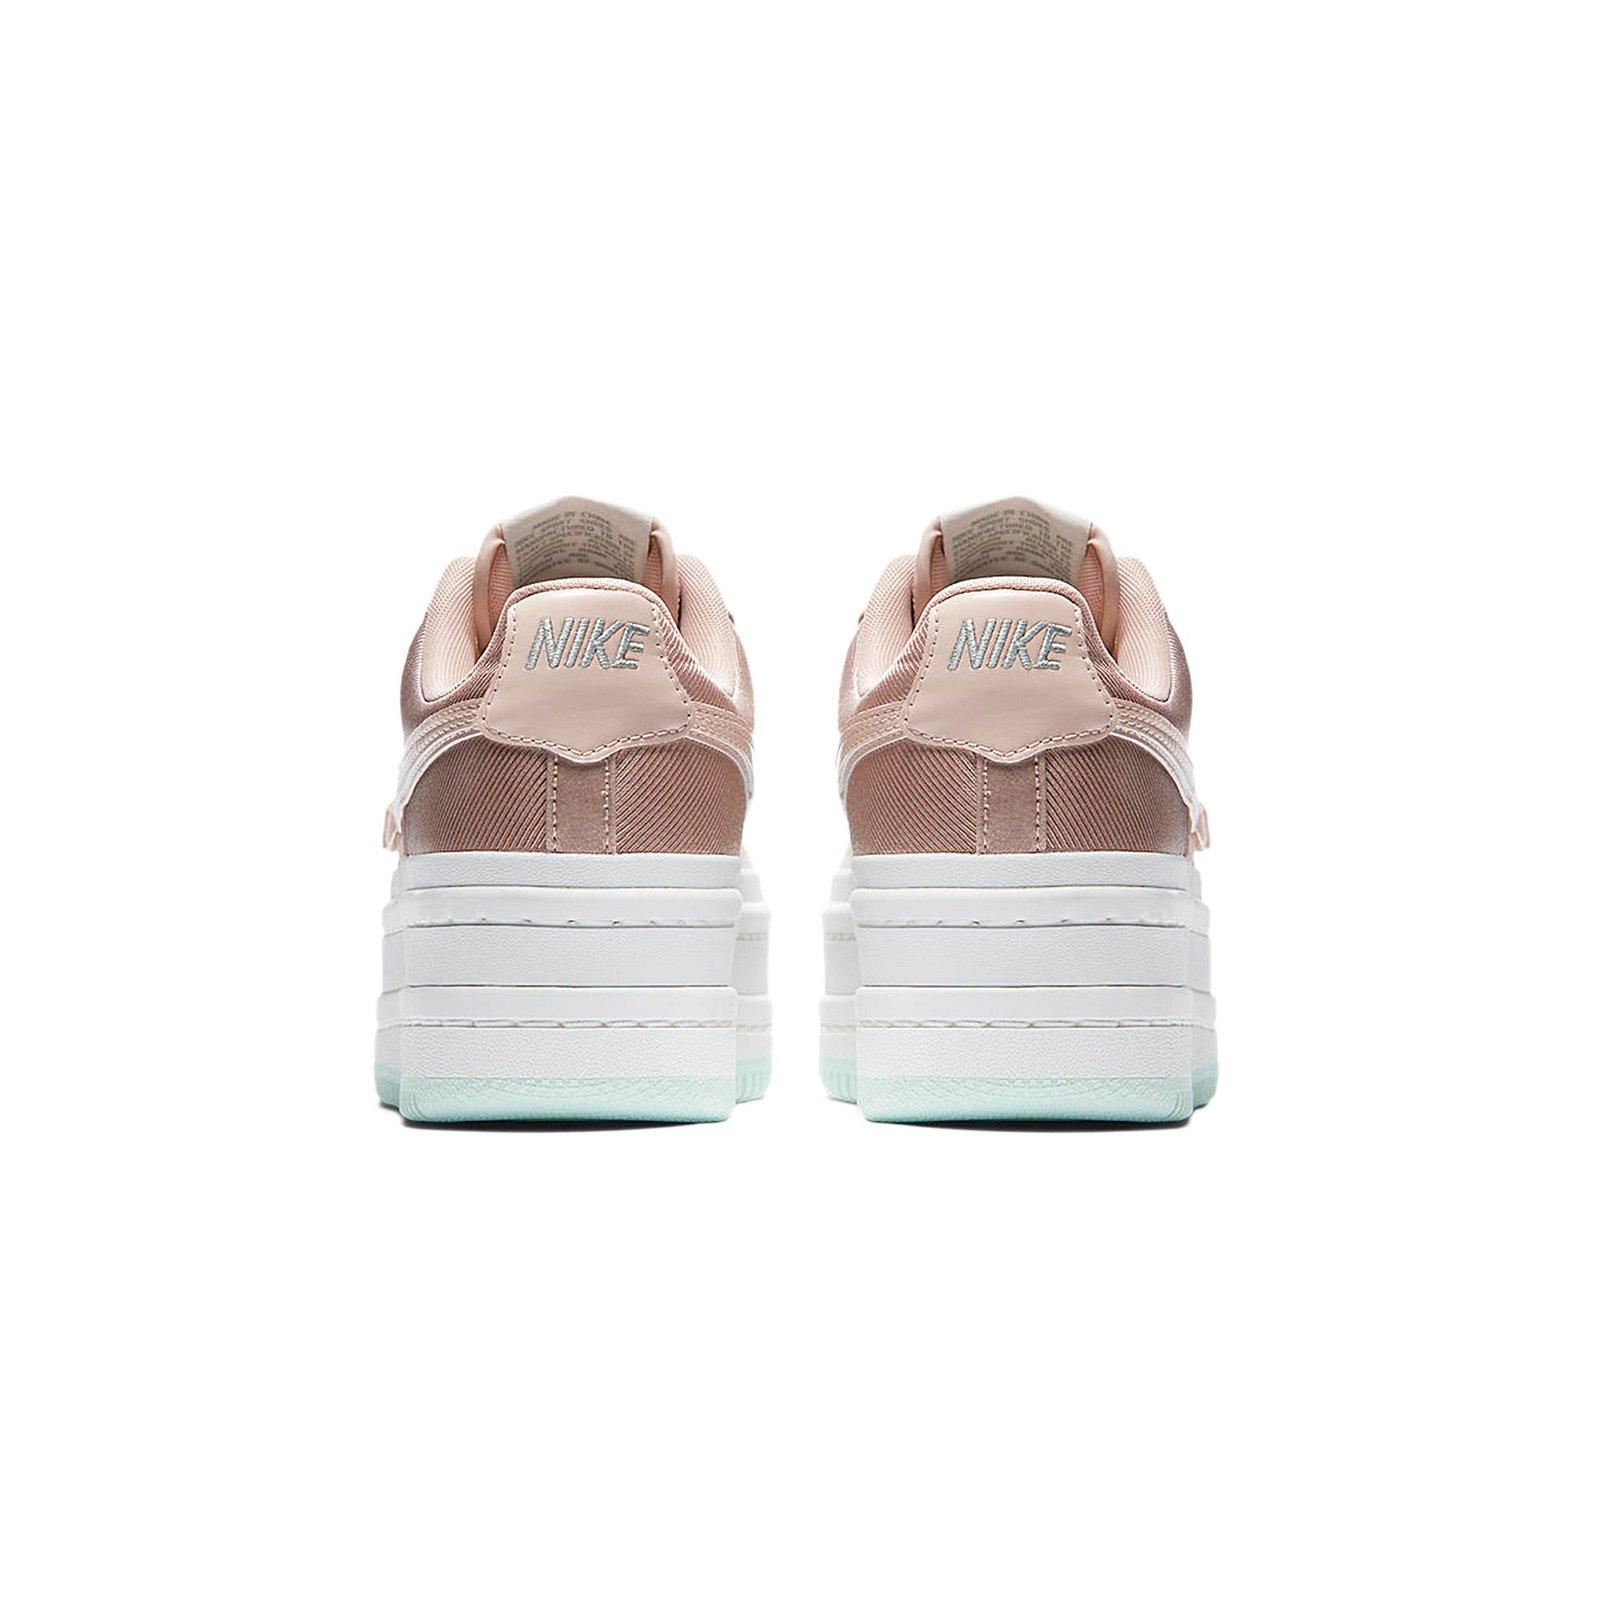 0e457820441 Nike Women s Vandal 2K (Particle Beige  Sail  White) Sizes ...